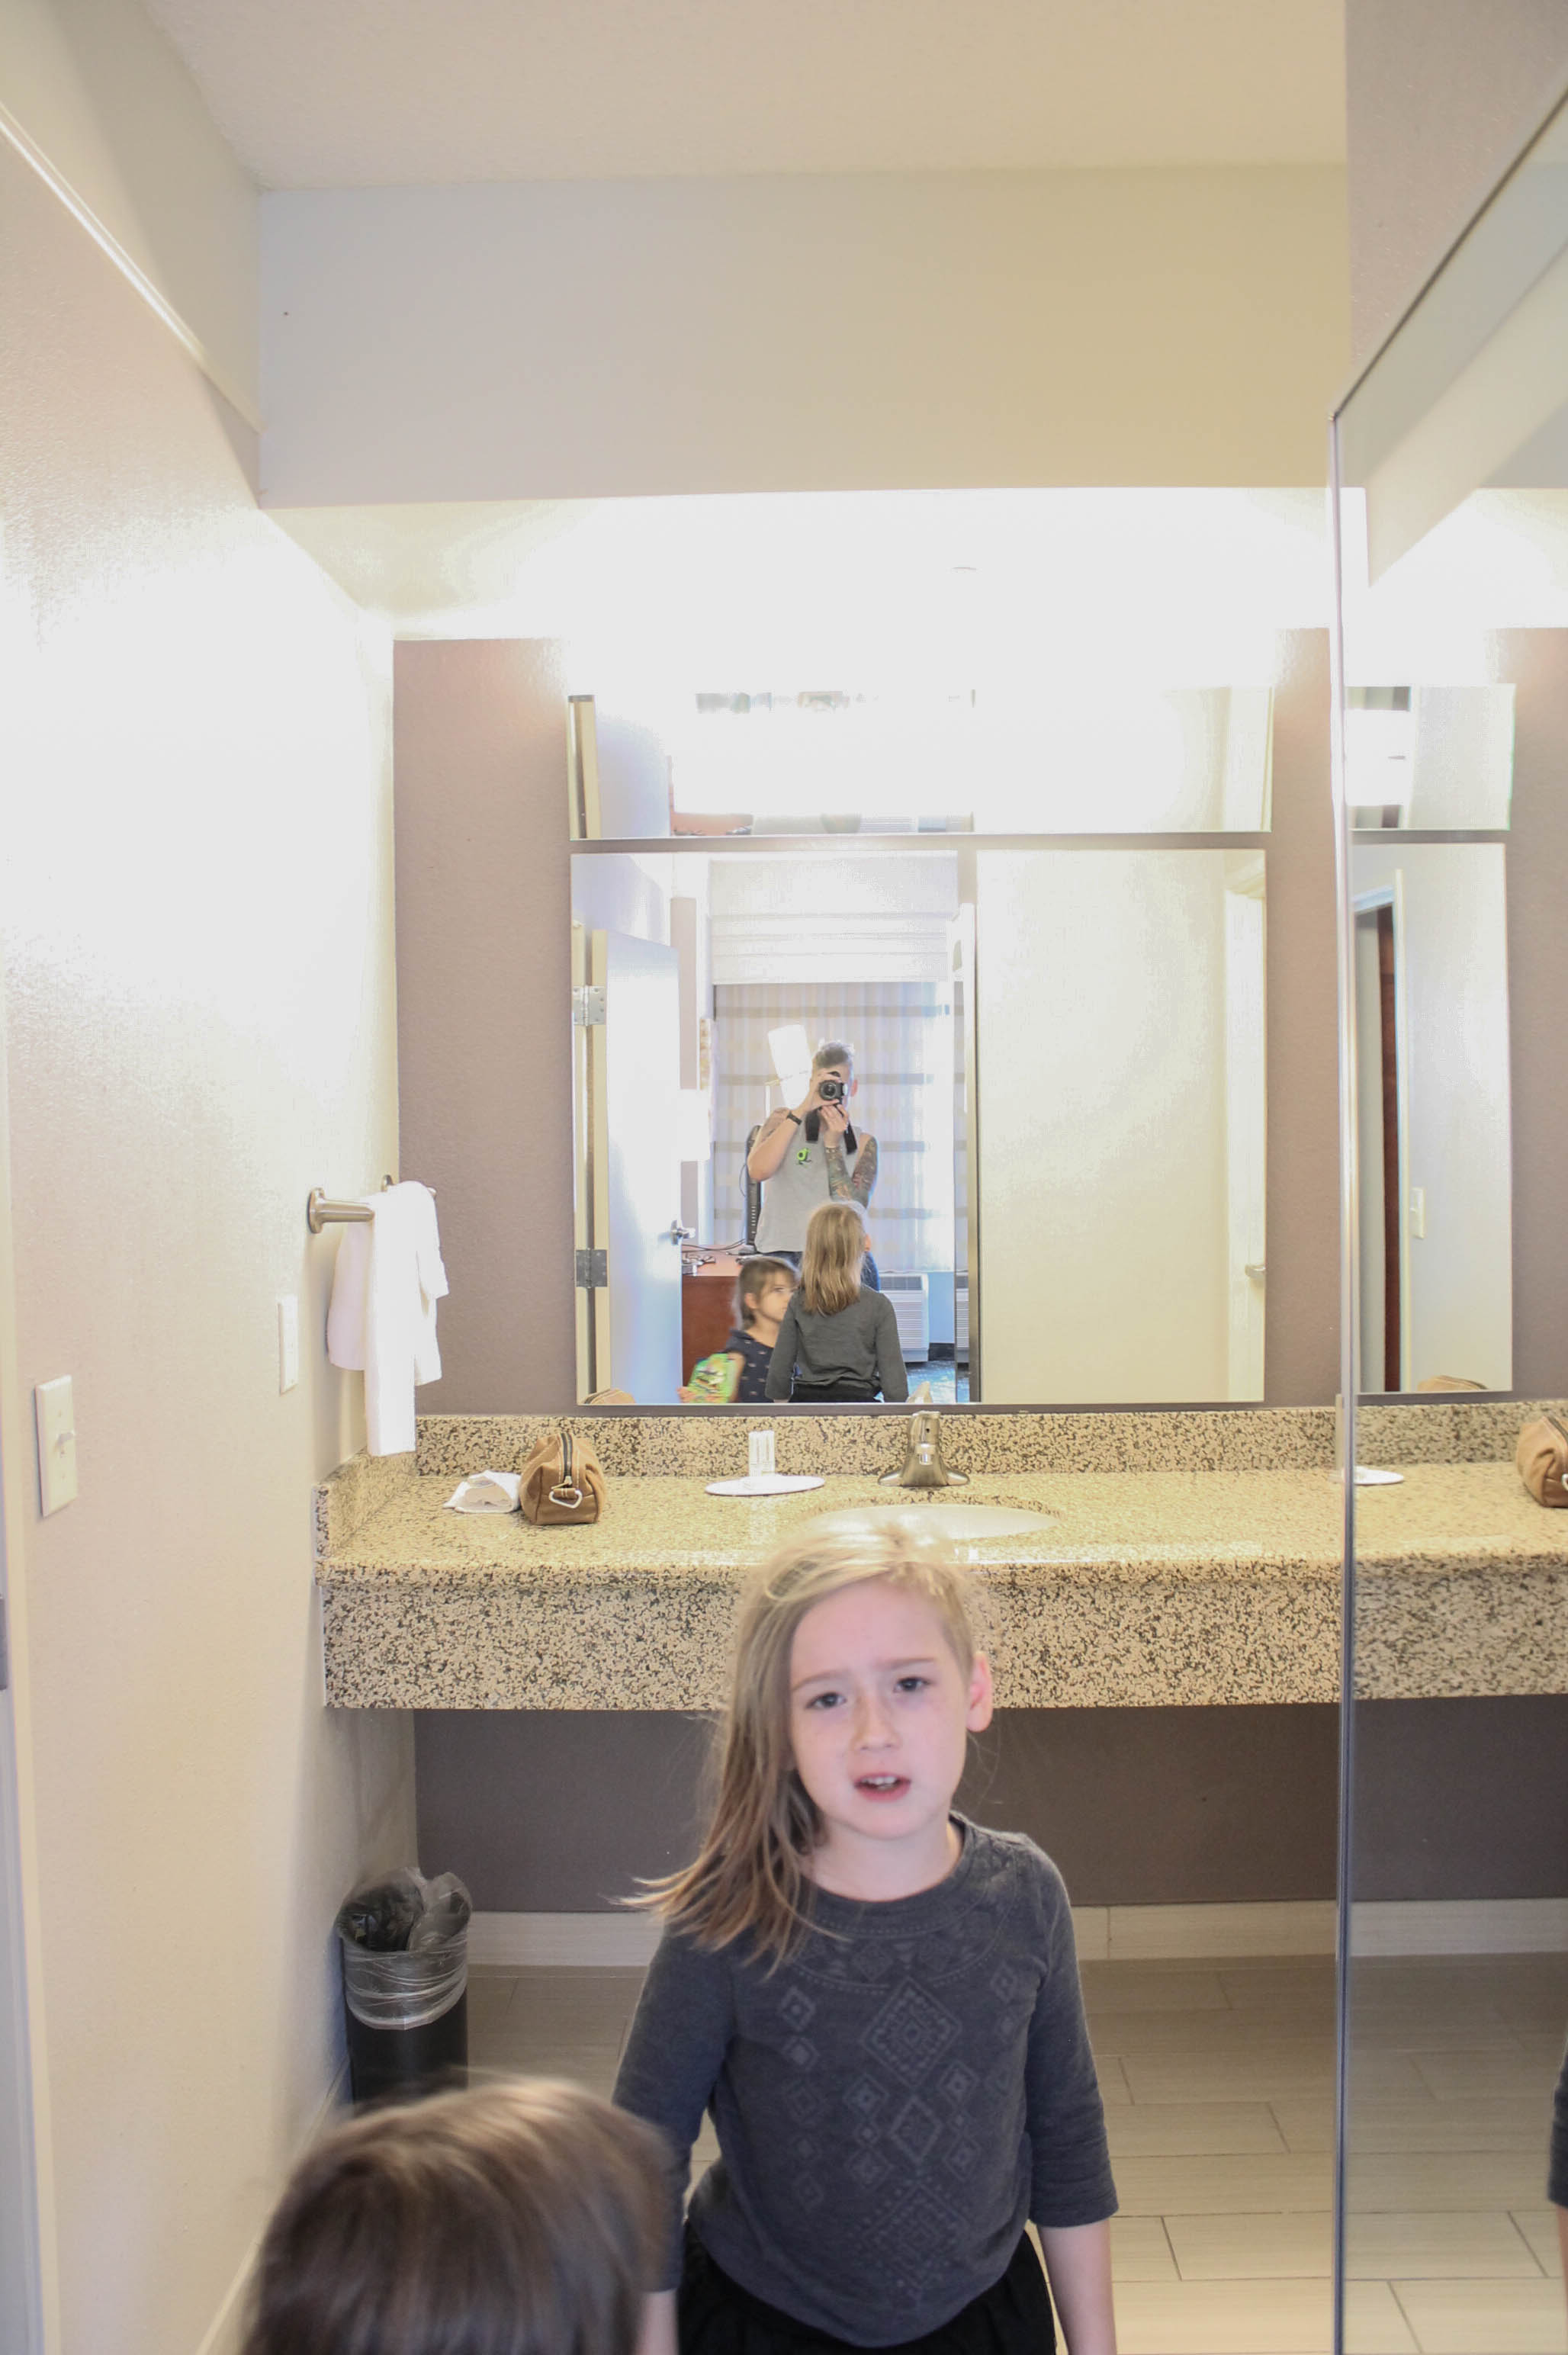 family-friendly hotels houston